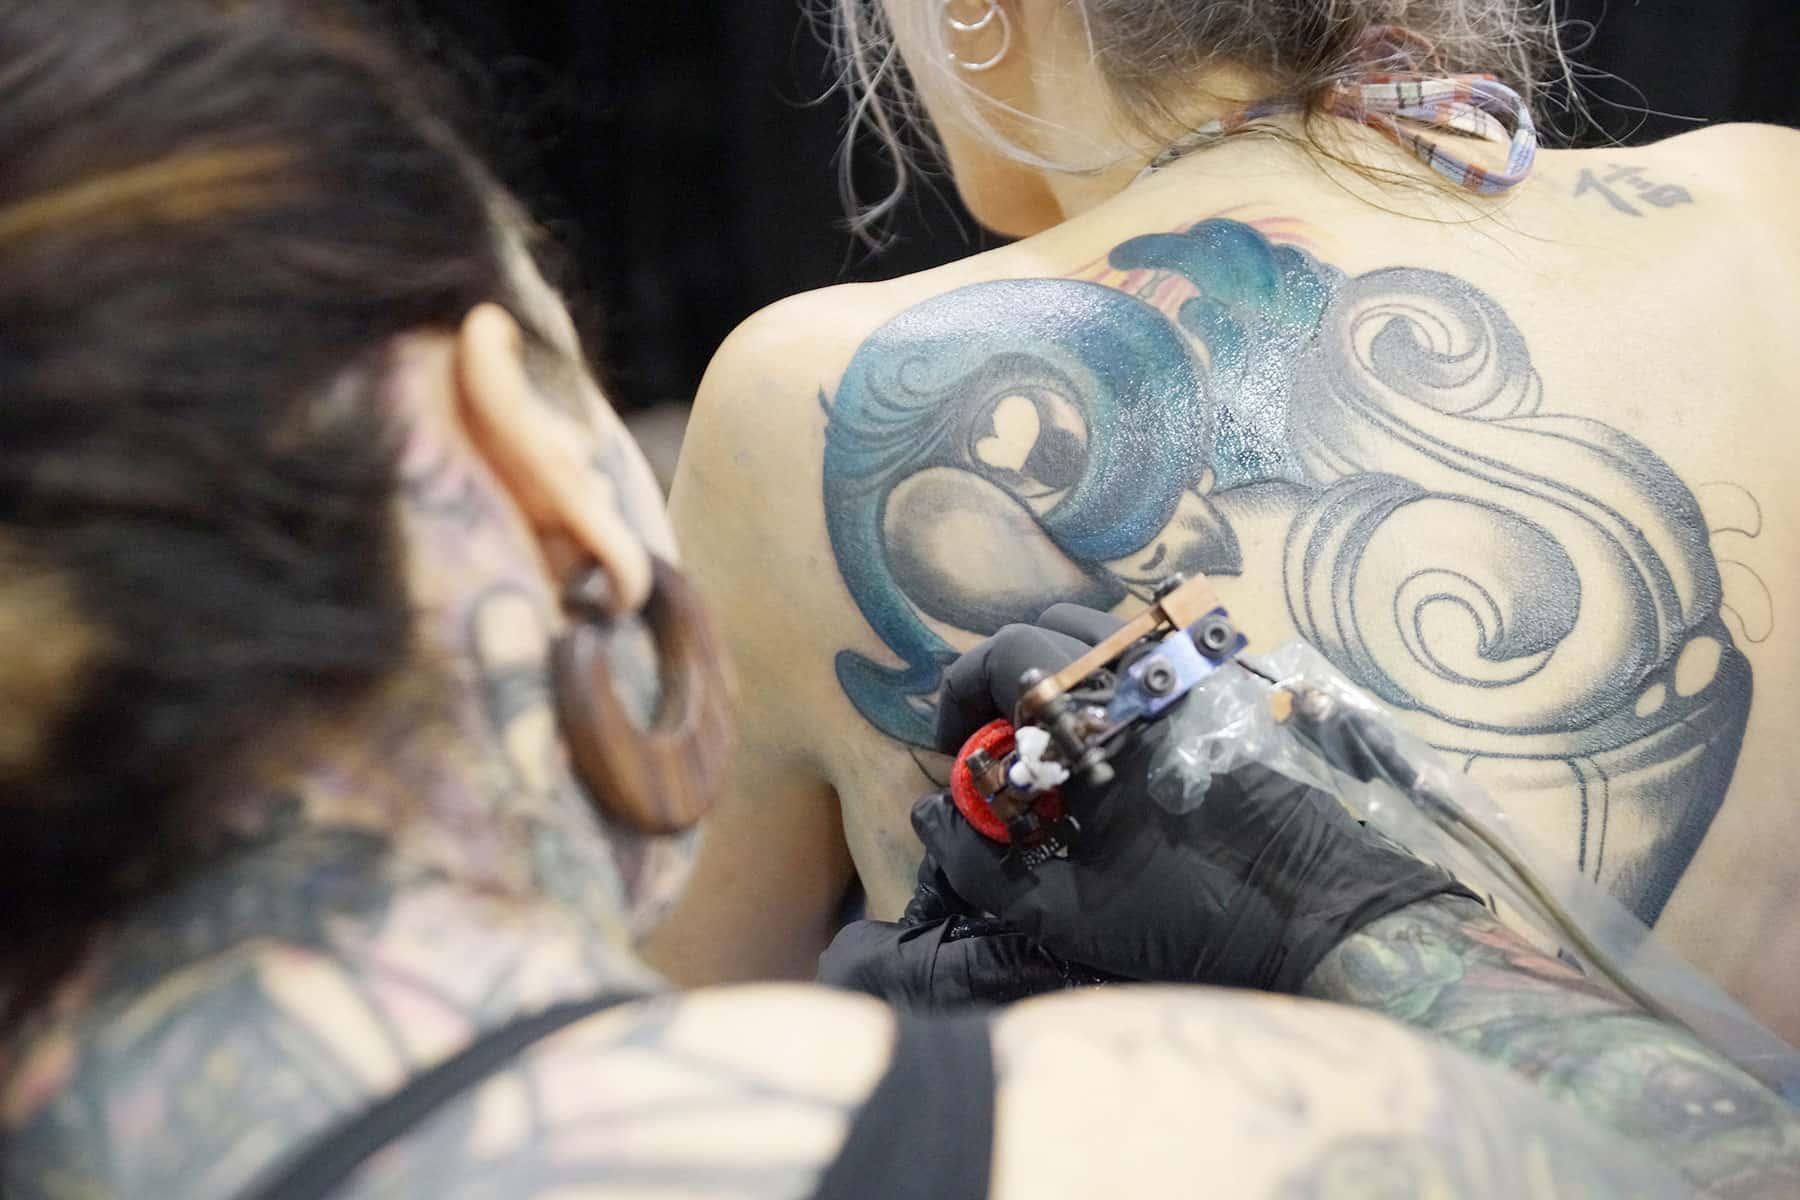 091517_tattooarts_1026_yir